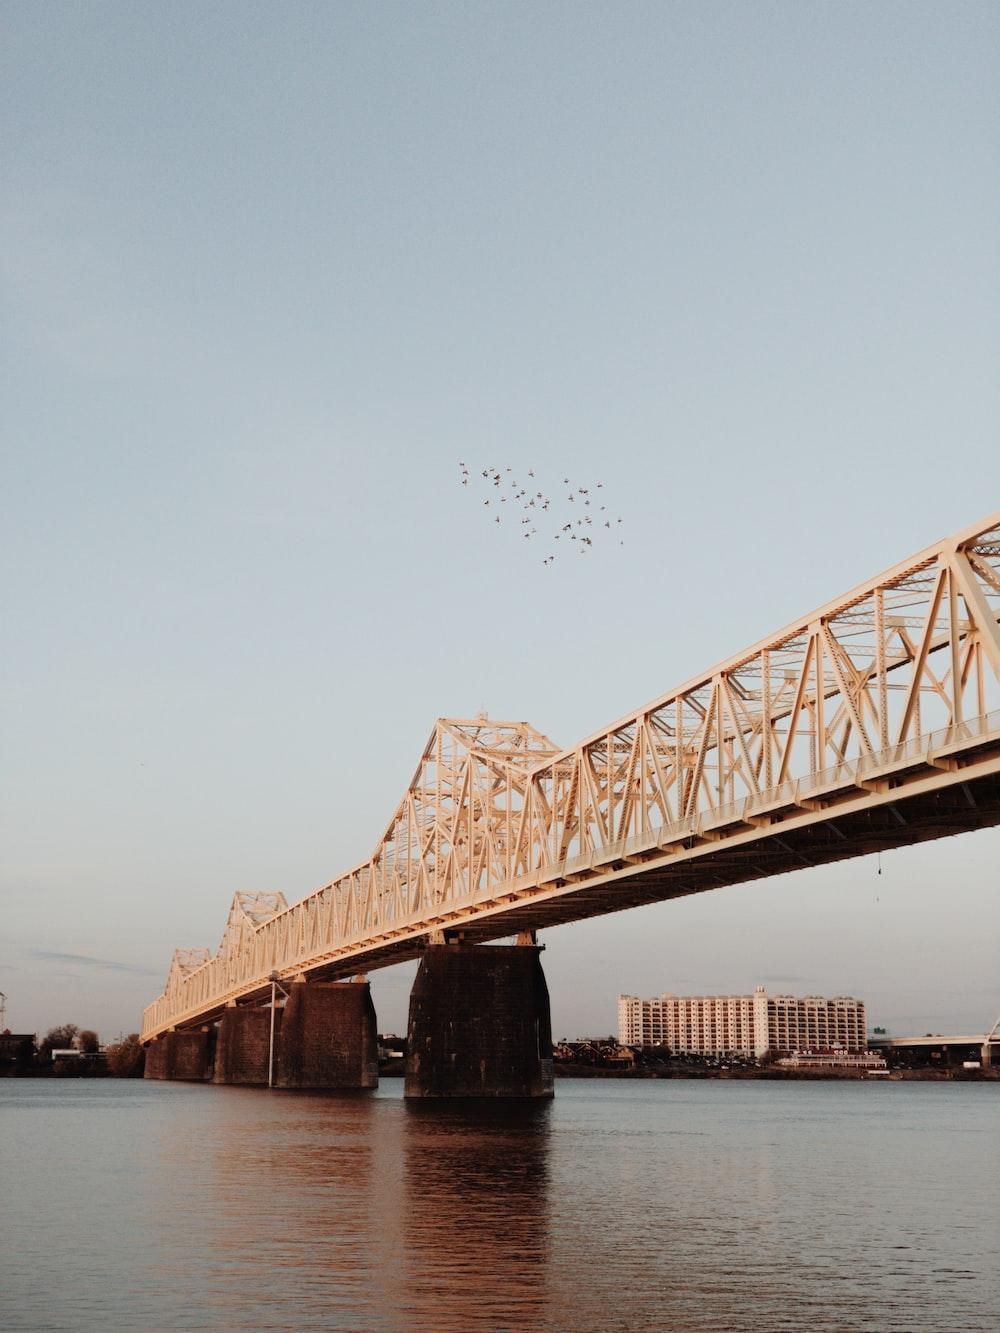 brown steel bridge during daytime